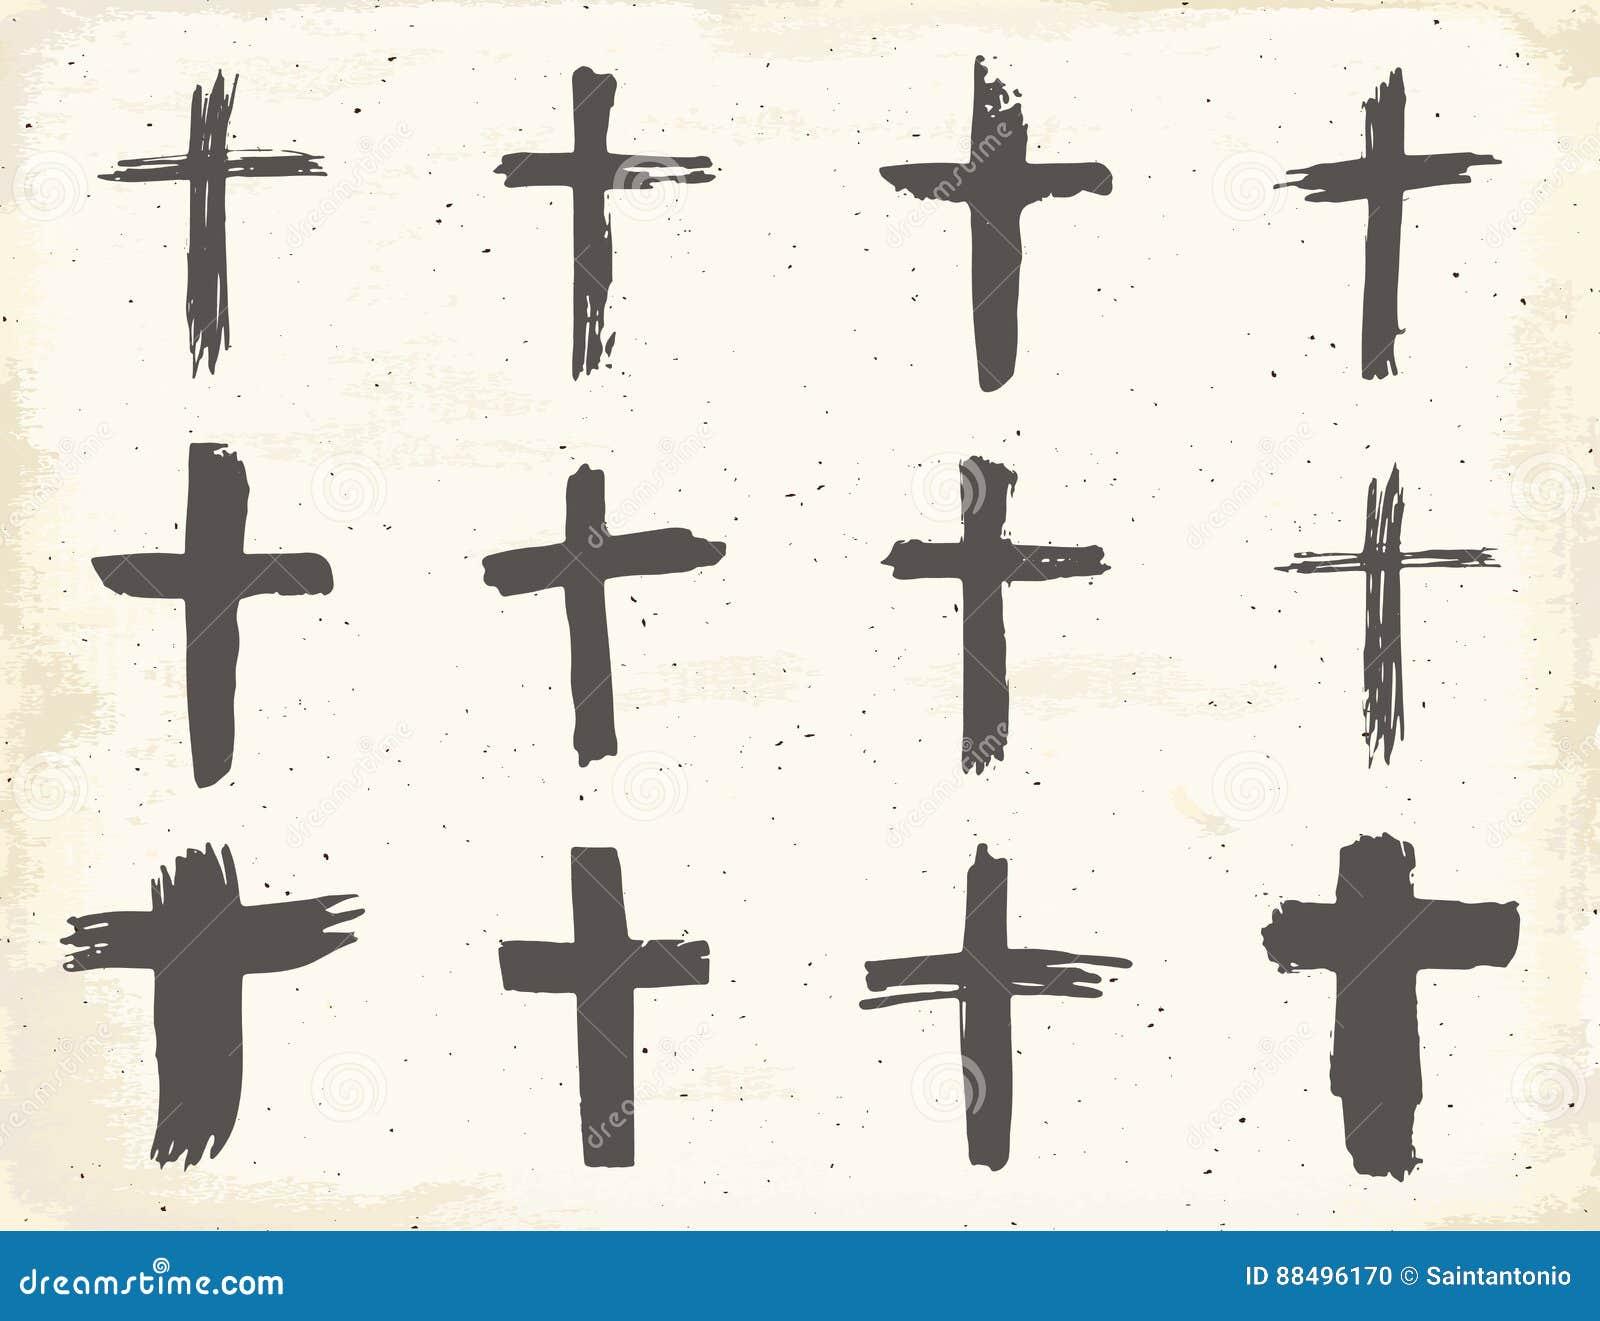 Grunge Hand Drawn Cross Symbols Set Christian Crosses Religious